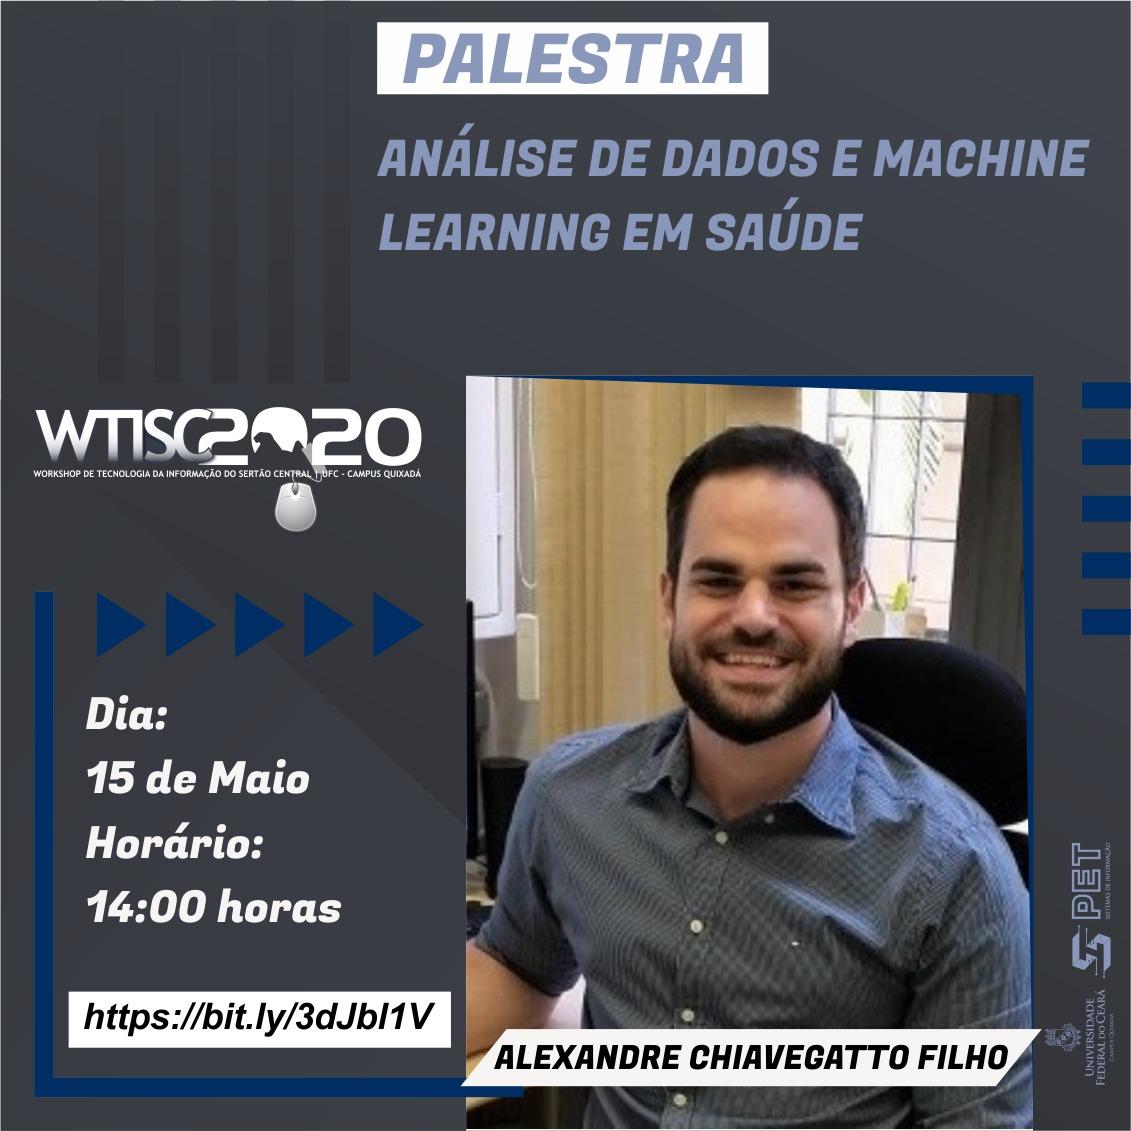 palestra_alexandre